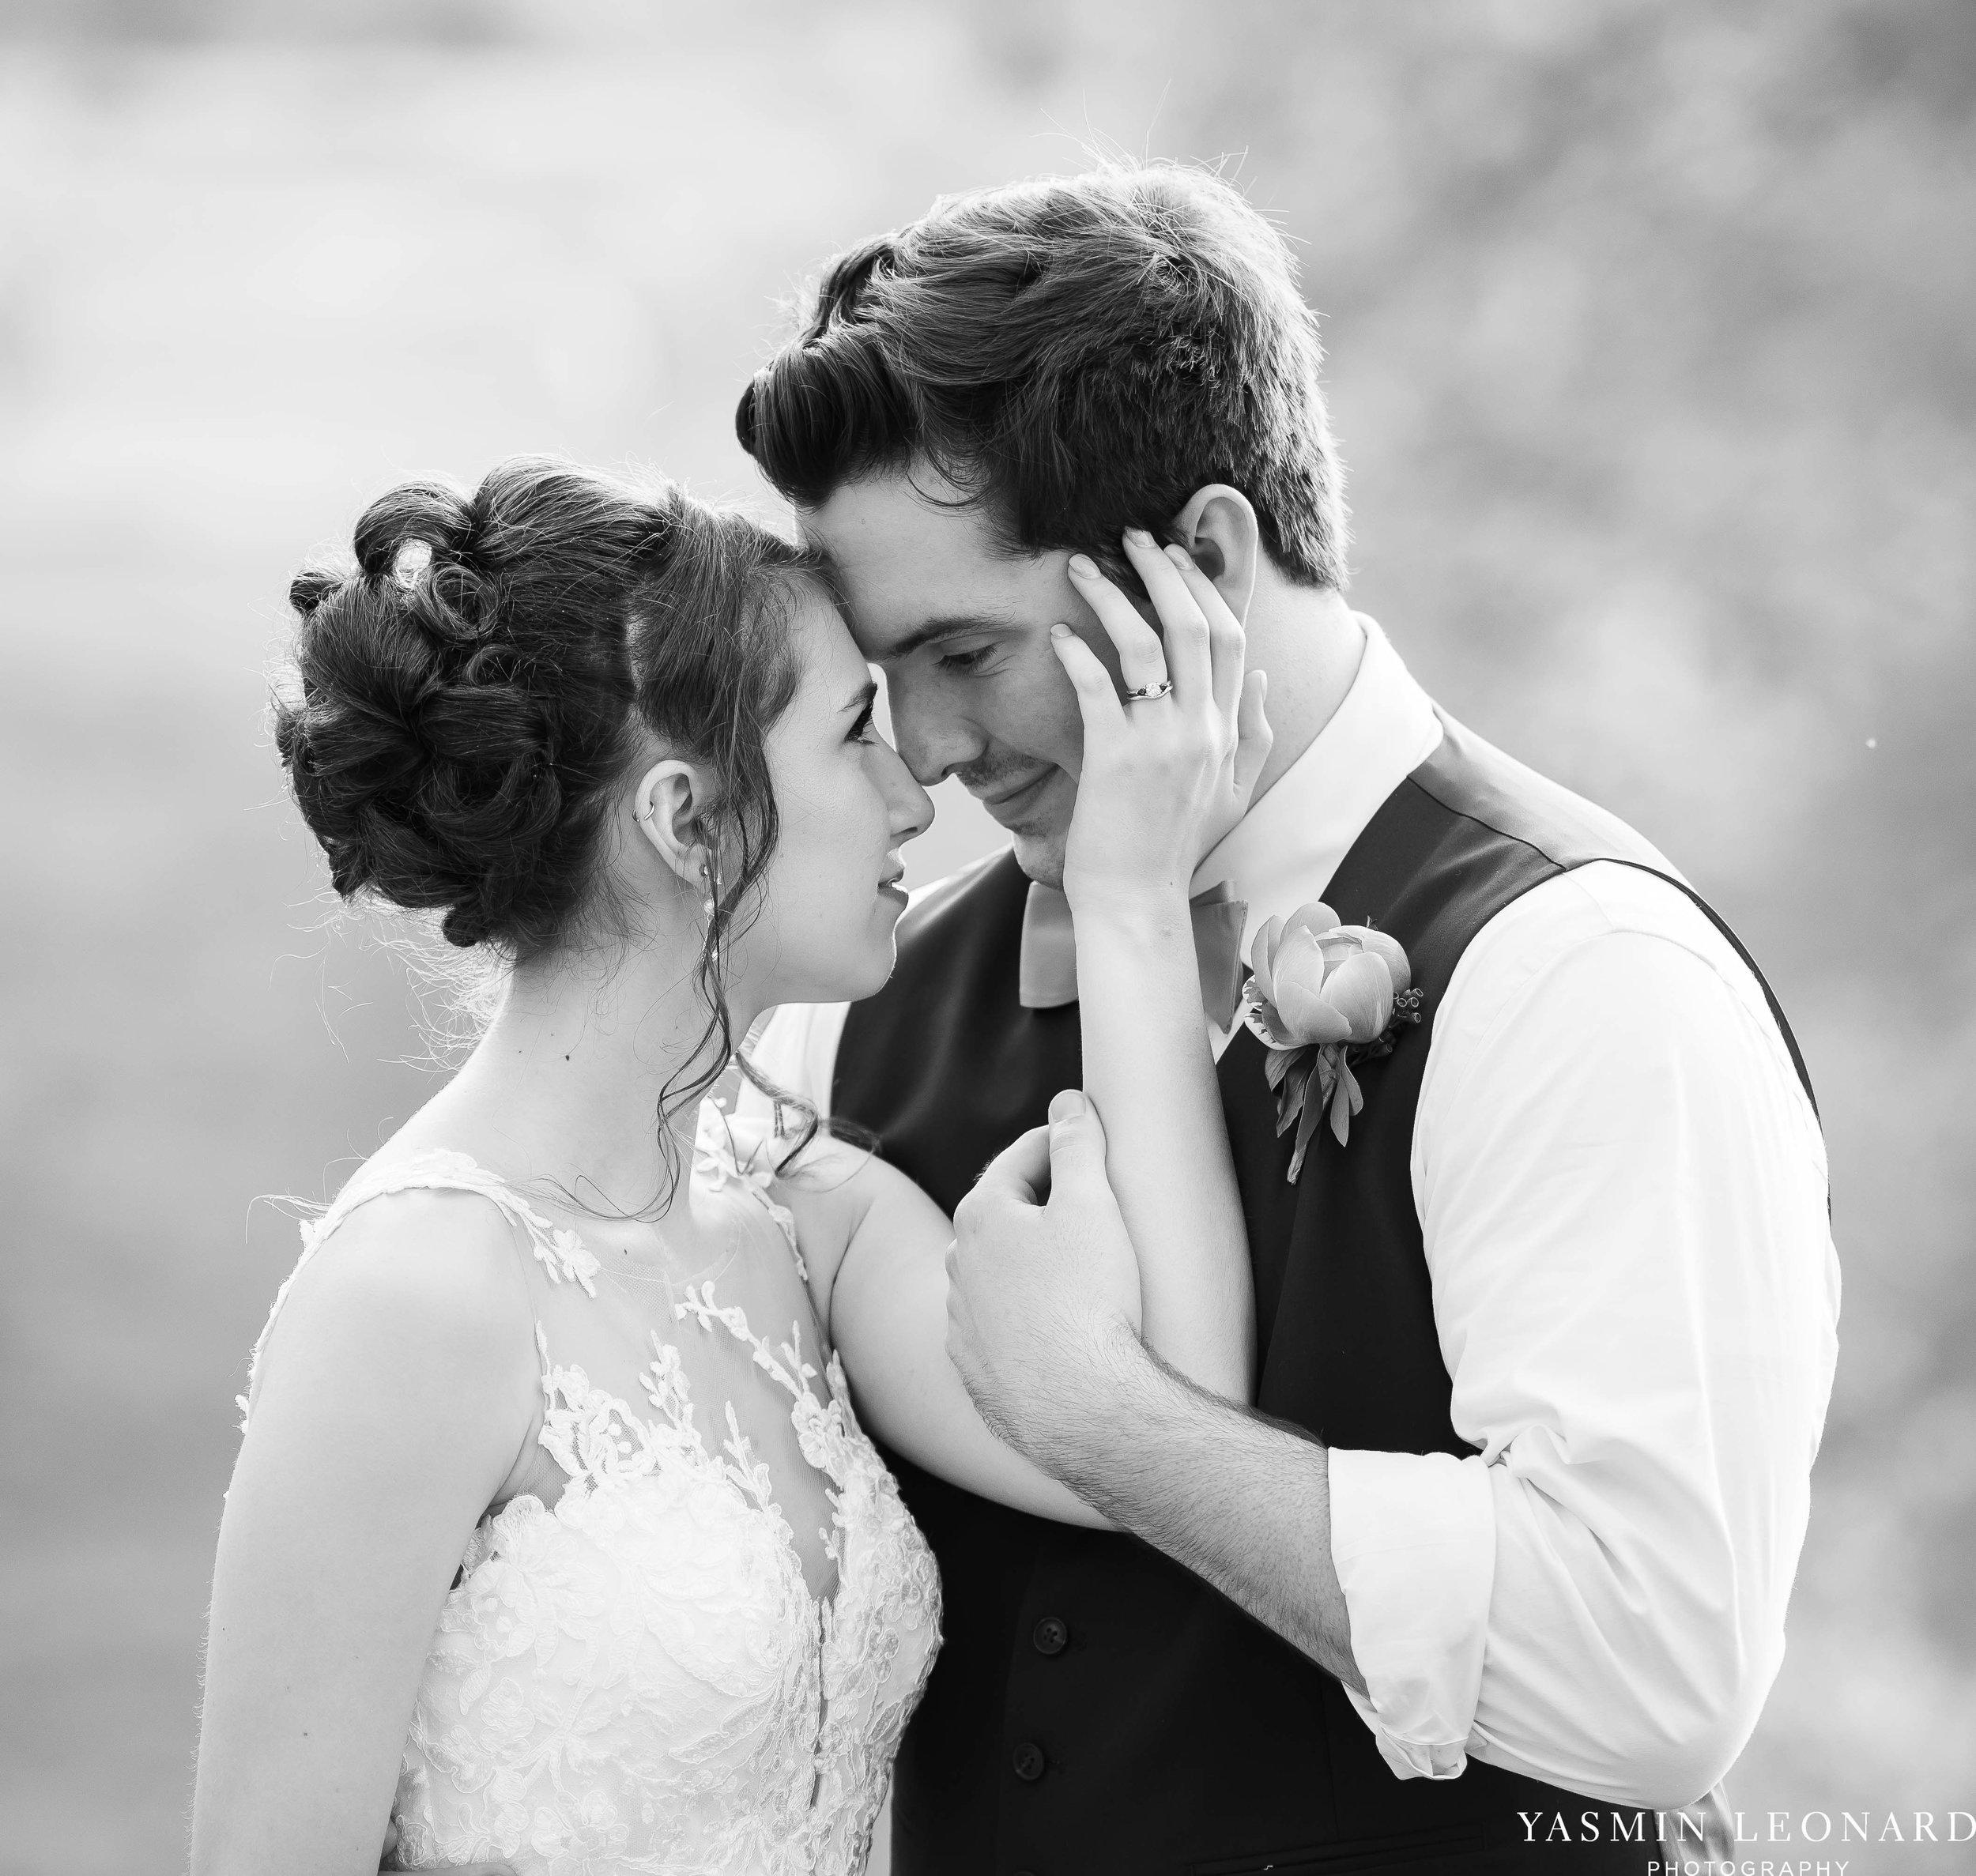 Old Homeplace Vineyard - NC Weddings - Outdoor Summer Weddings - Peony Boutique - Vineyard Wedding - NC Photographer - Yasmin Leonard Photography-56.jpg